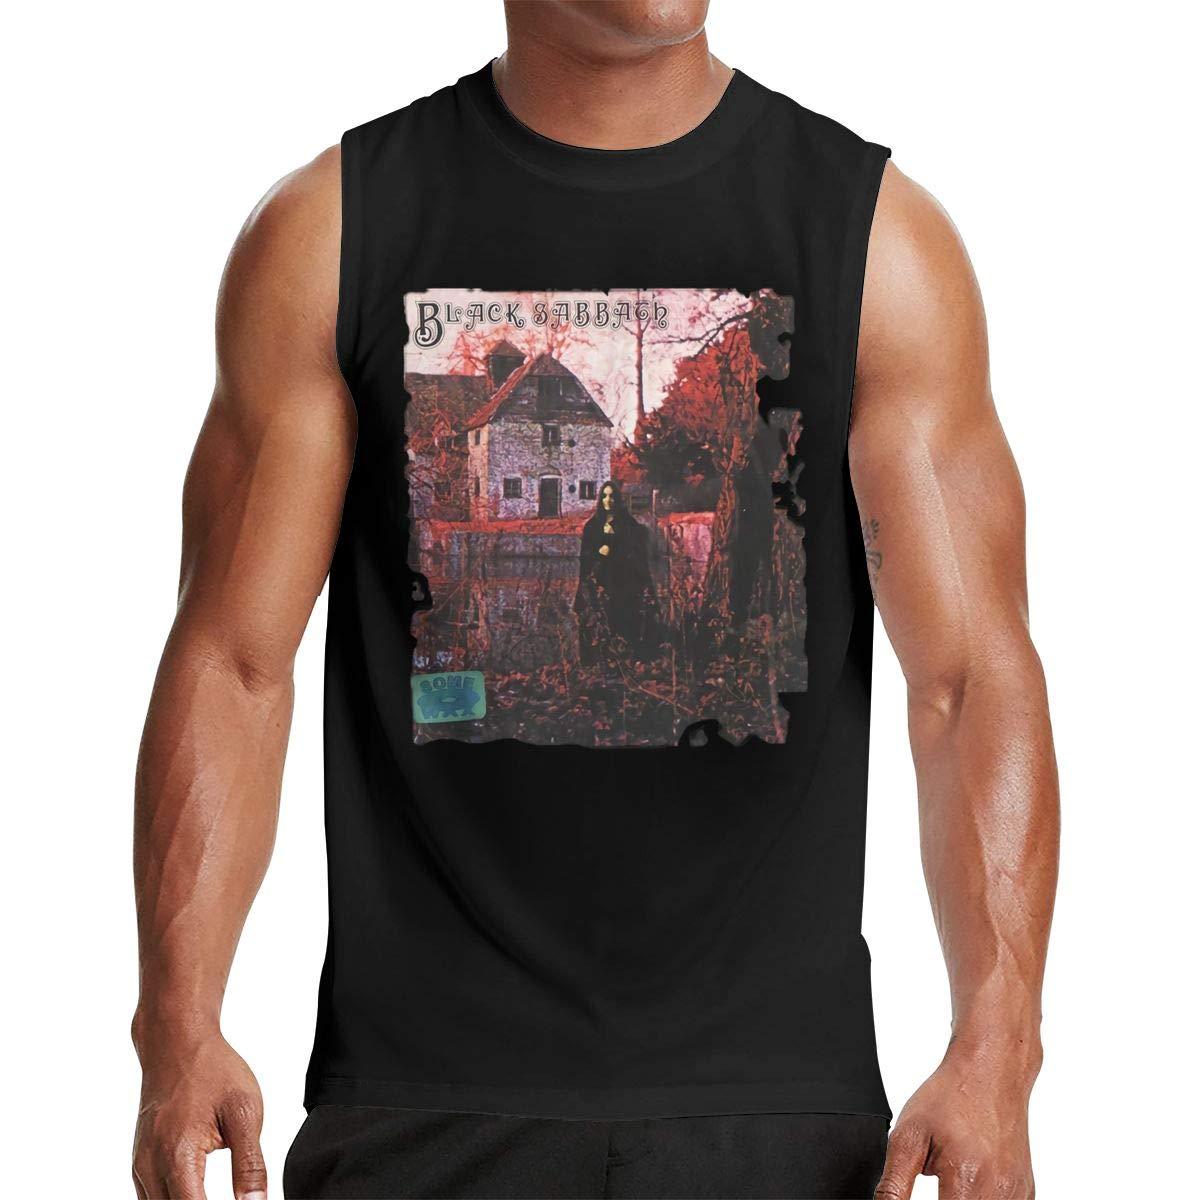 Thomlarryca Black Sabbath S Gym Muscle T Shirt Classic Athletic Sleeveless T Shirts Bl